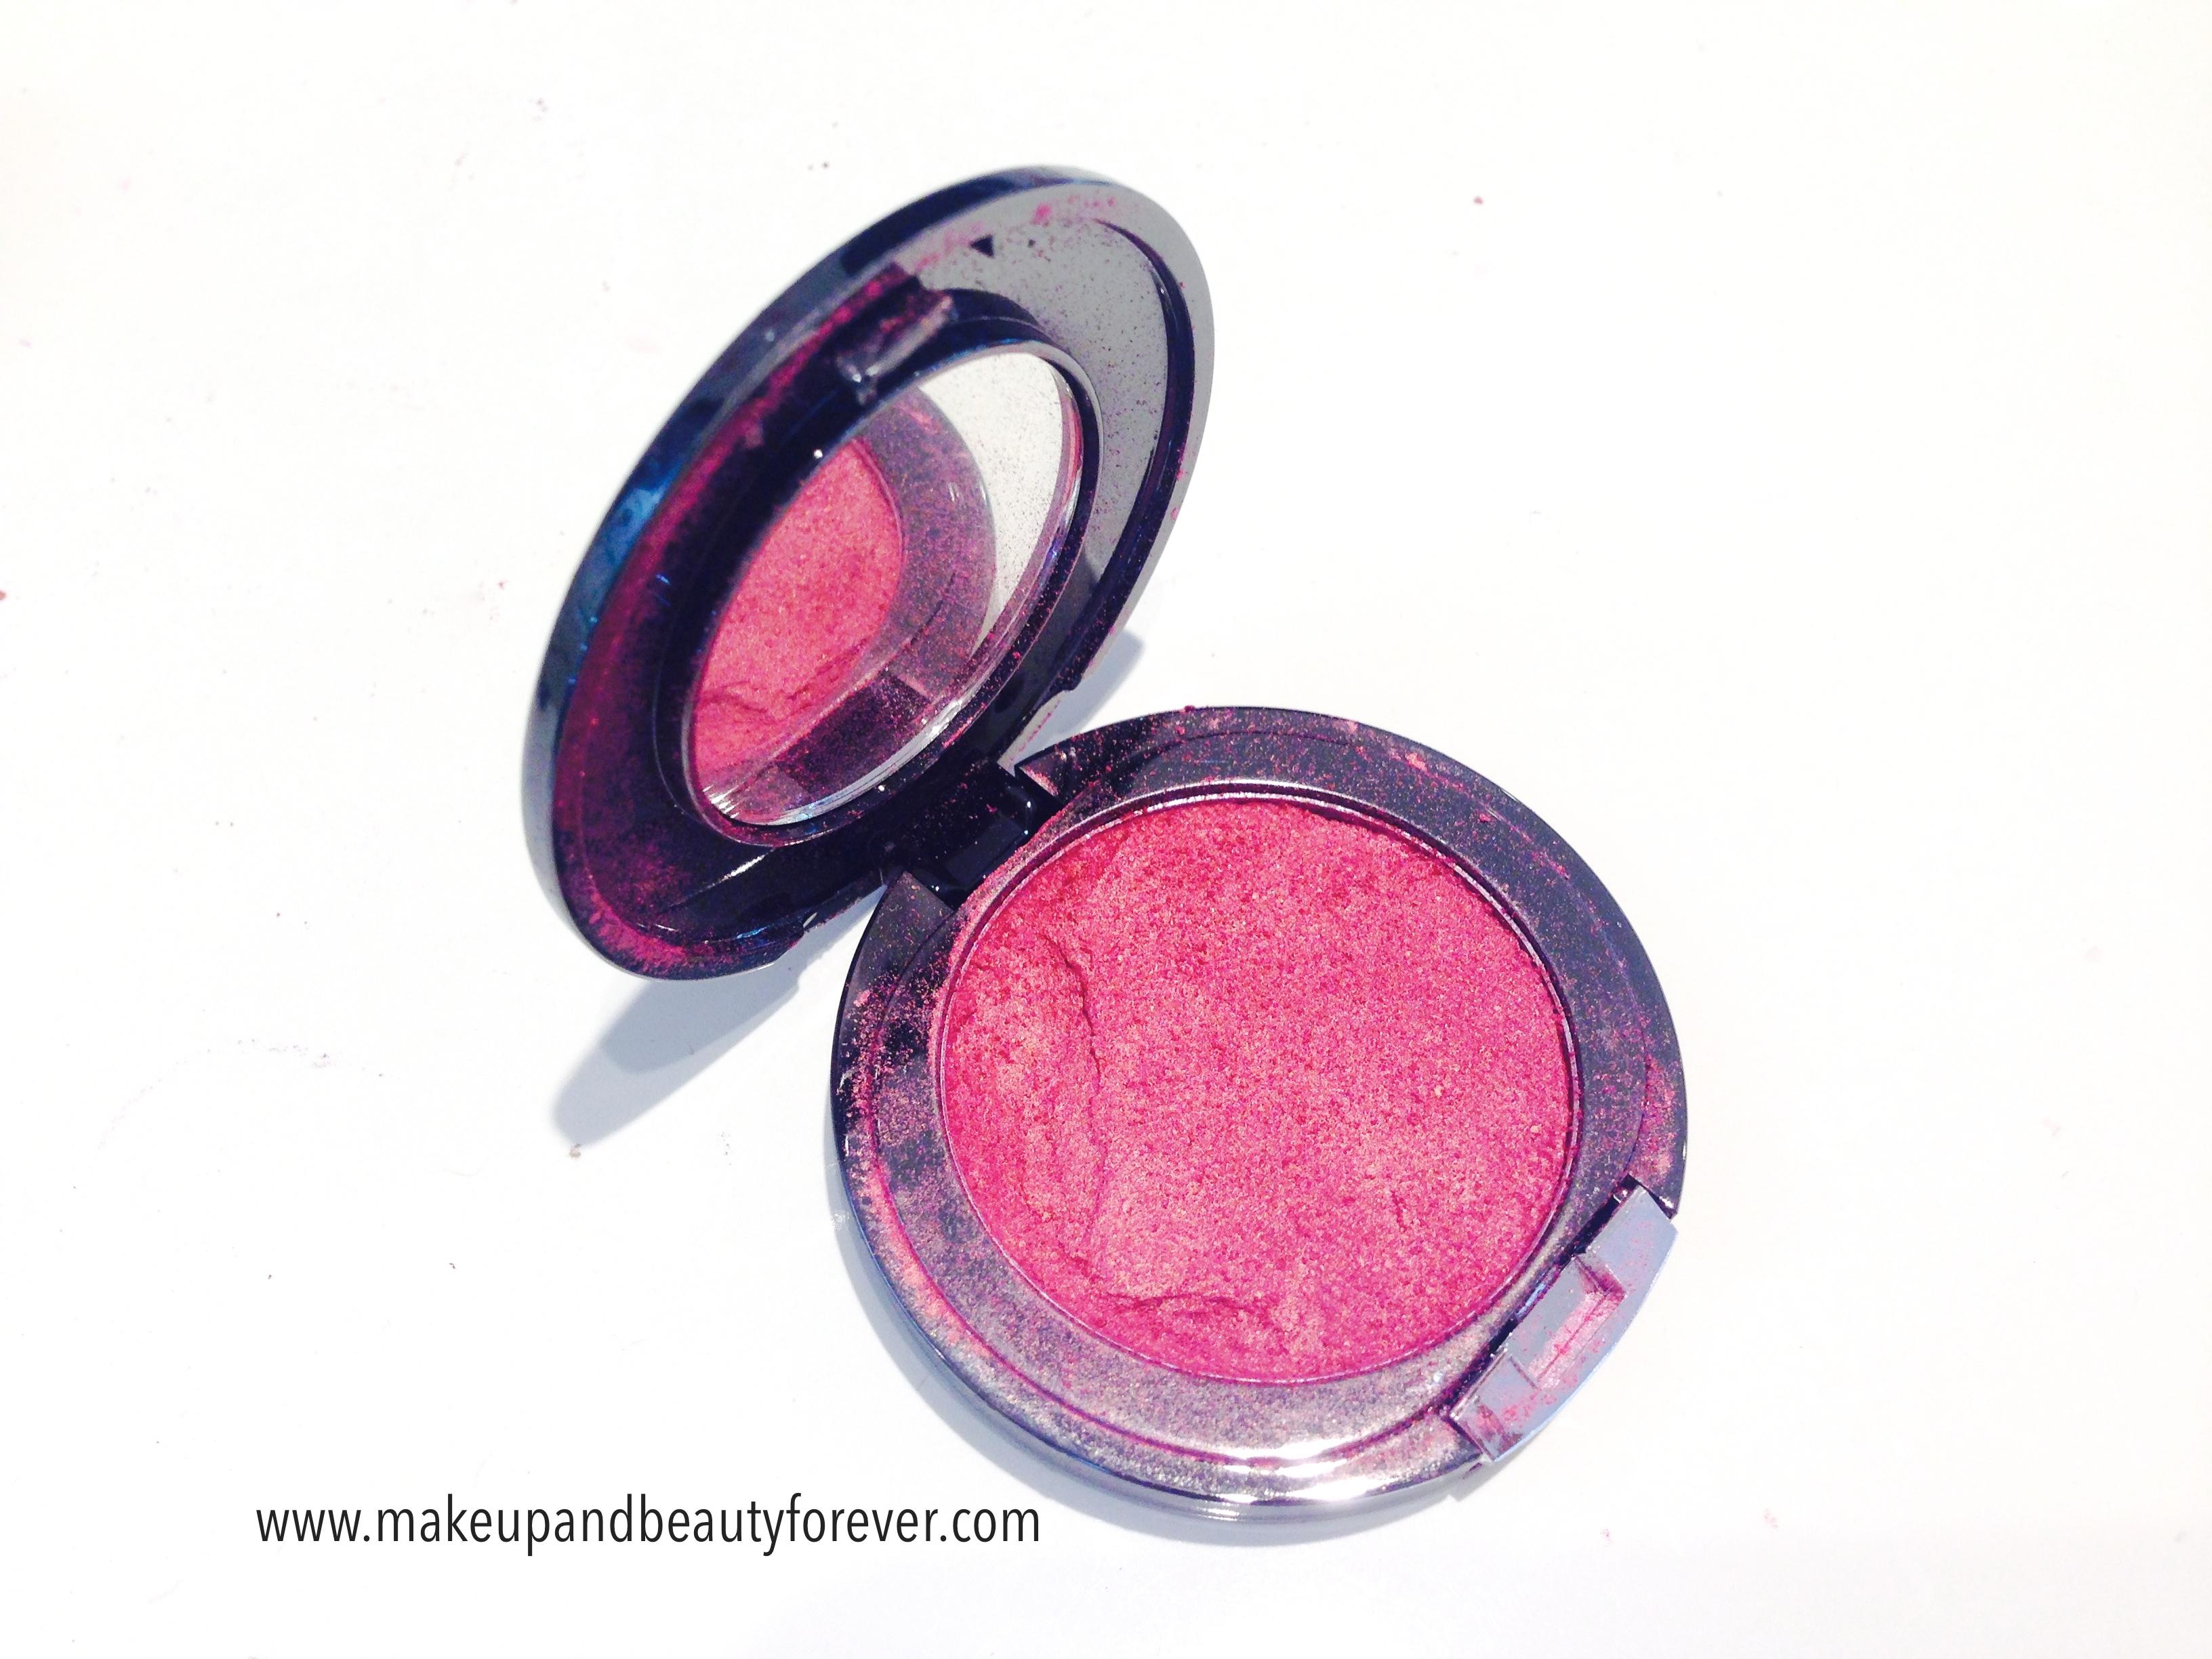 Faces Canada Glam On Powder Blush Crimson 4 Review shades